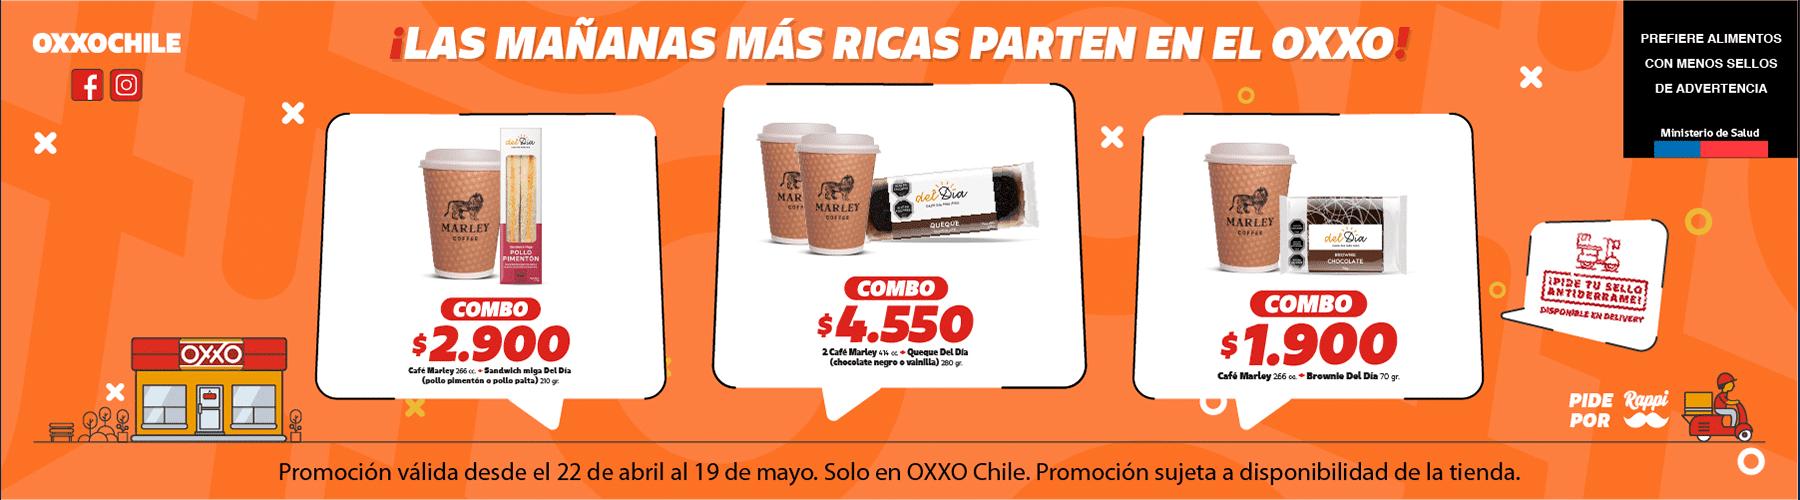 OXXO Chile Café Marley P5 2021